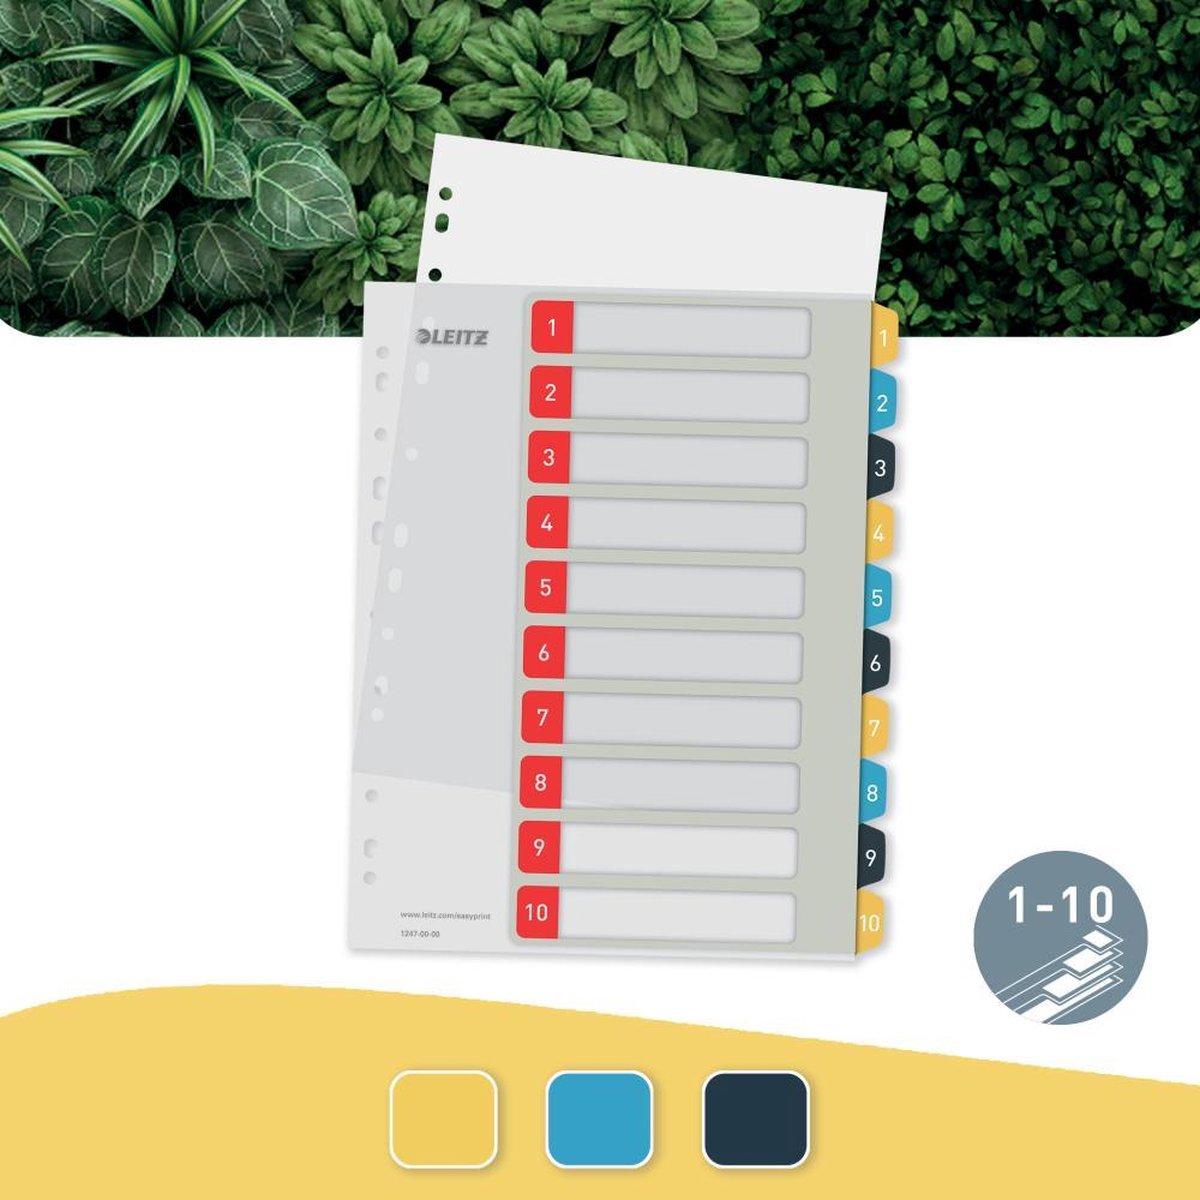 Leitz Cosy Printbare PP Tabbladen - 1-10 Numerieke Tabbladen - Tabbladen a4 - Tabbladen Voor Ordners